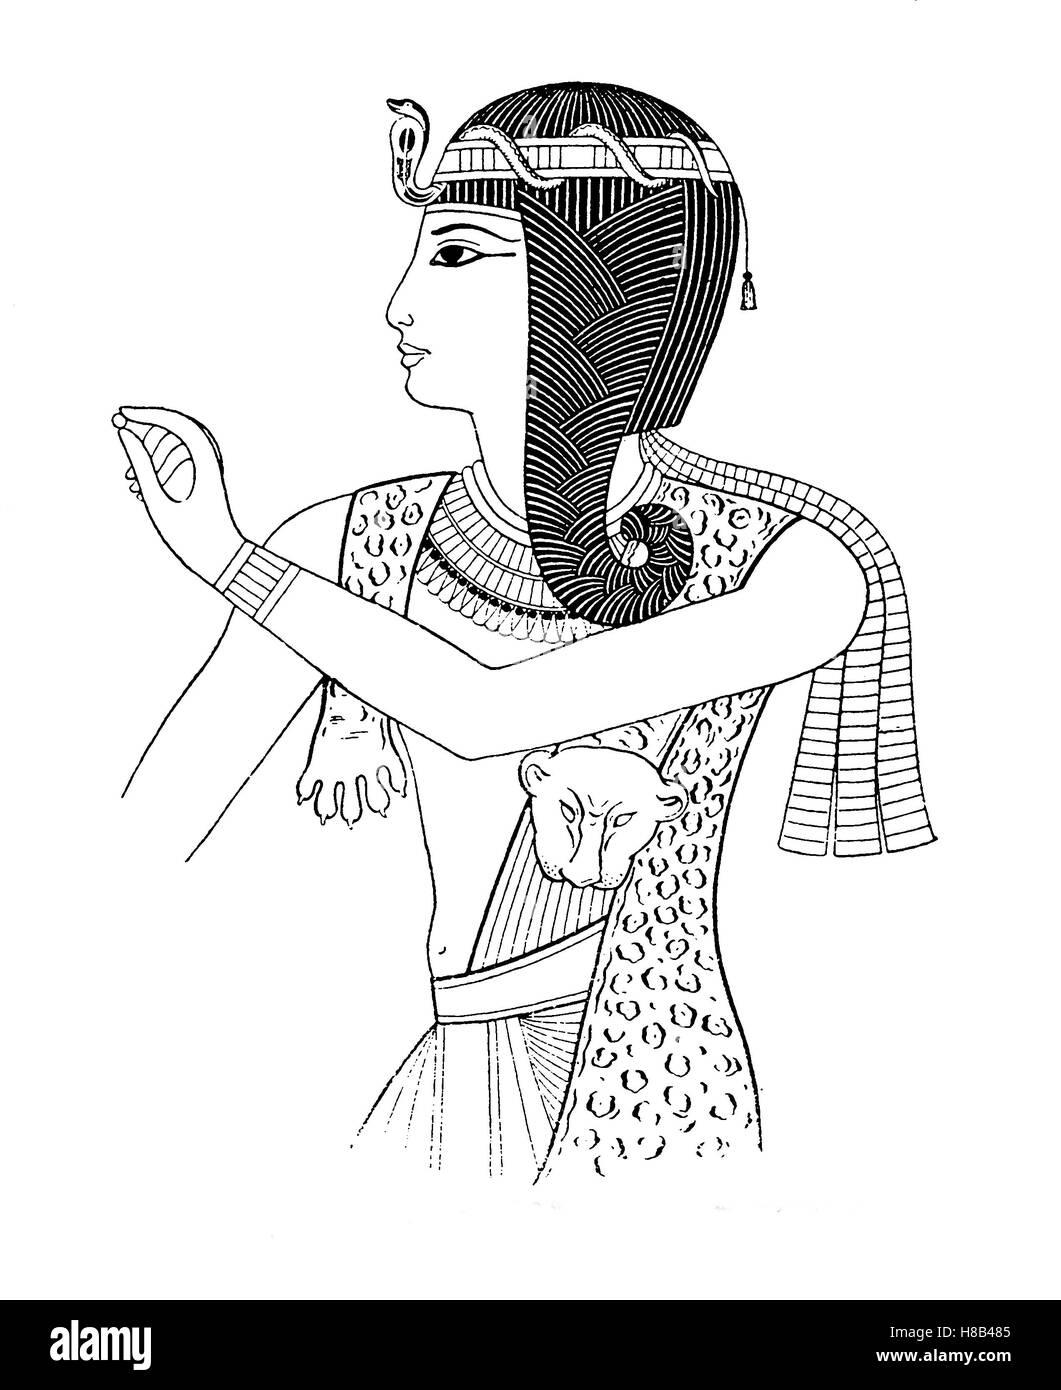 Pharaoh Ramses II, 19th Dynasty, Egypt, here with Uraeussnake, History of fashion, costume story - Stock Image